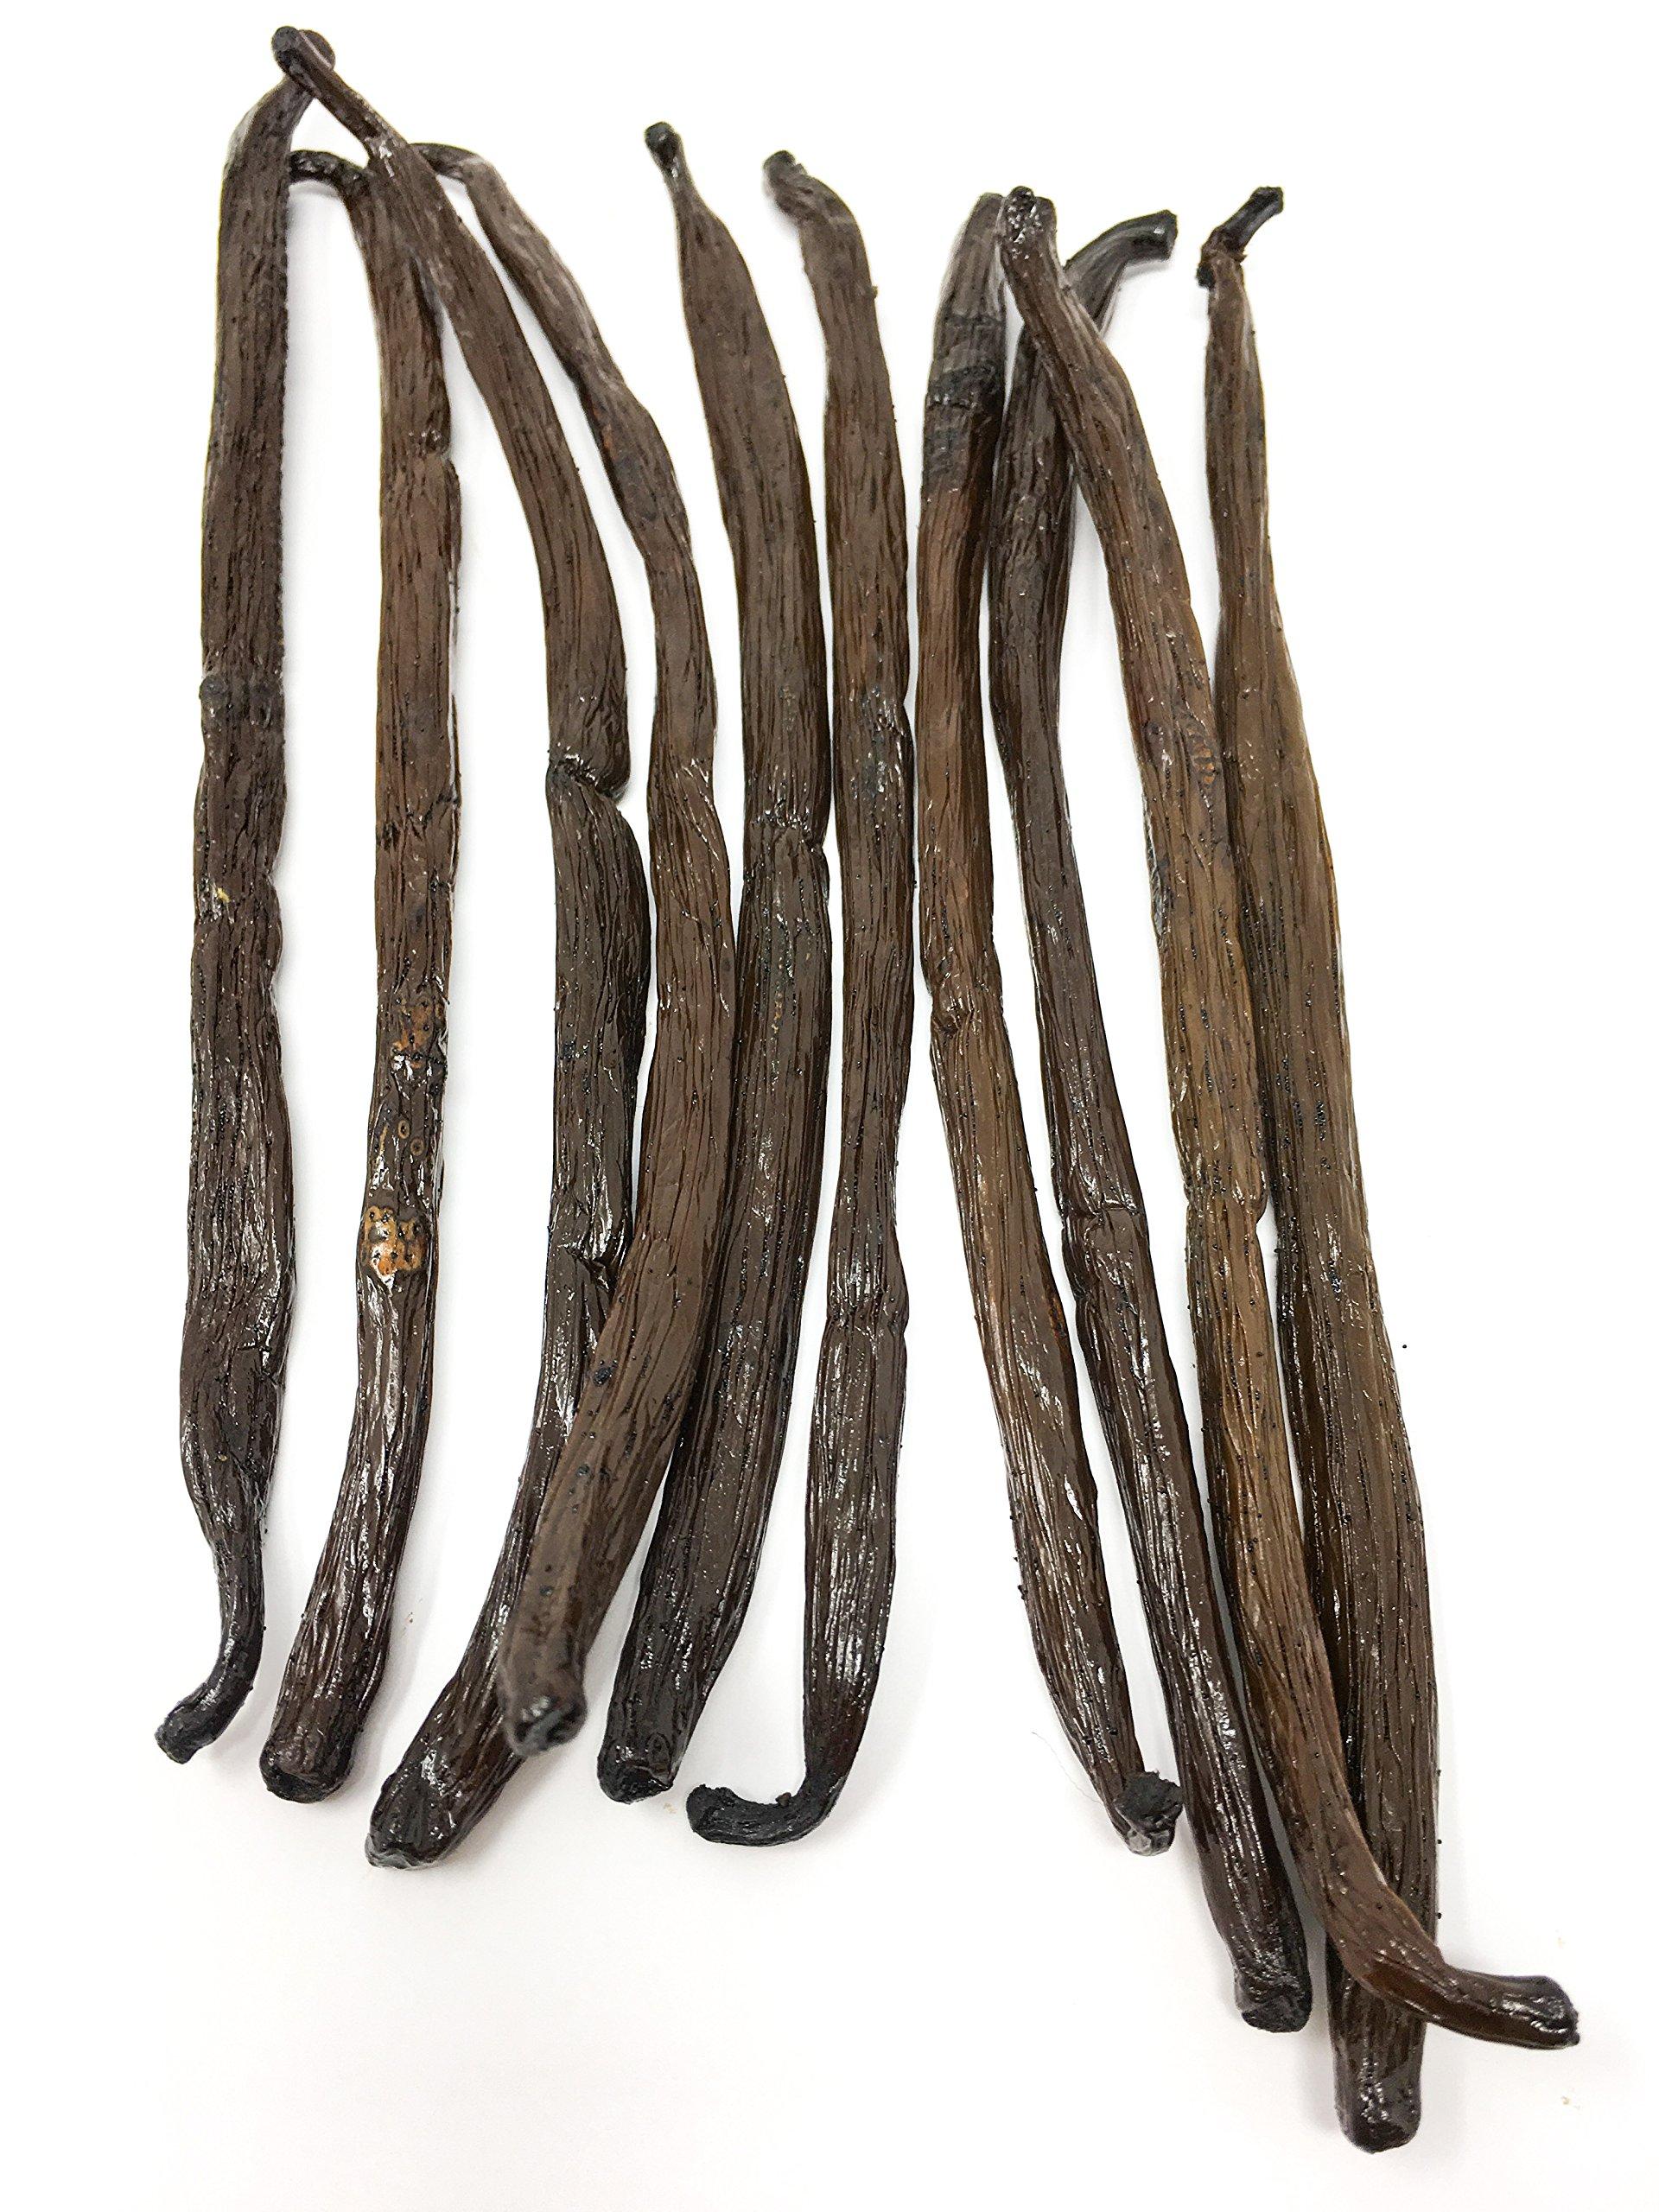 Madagascar Bourbon Vanilla Beans (Vanilla Planifolia) by Slofoodgroup (10 vanilla beans)